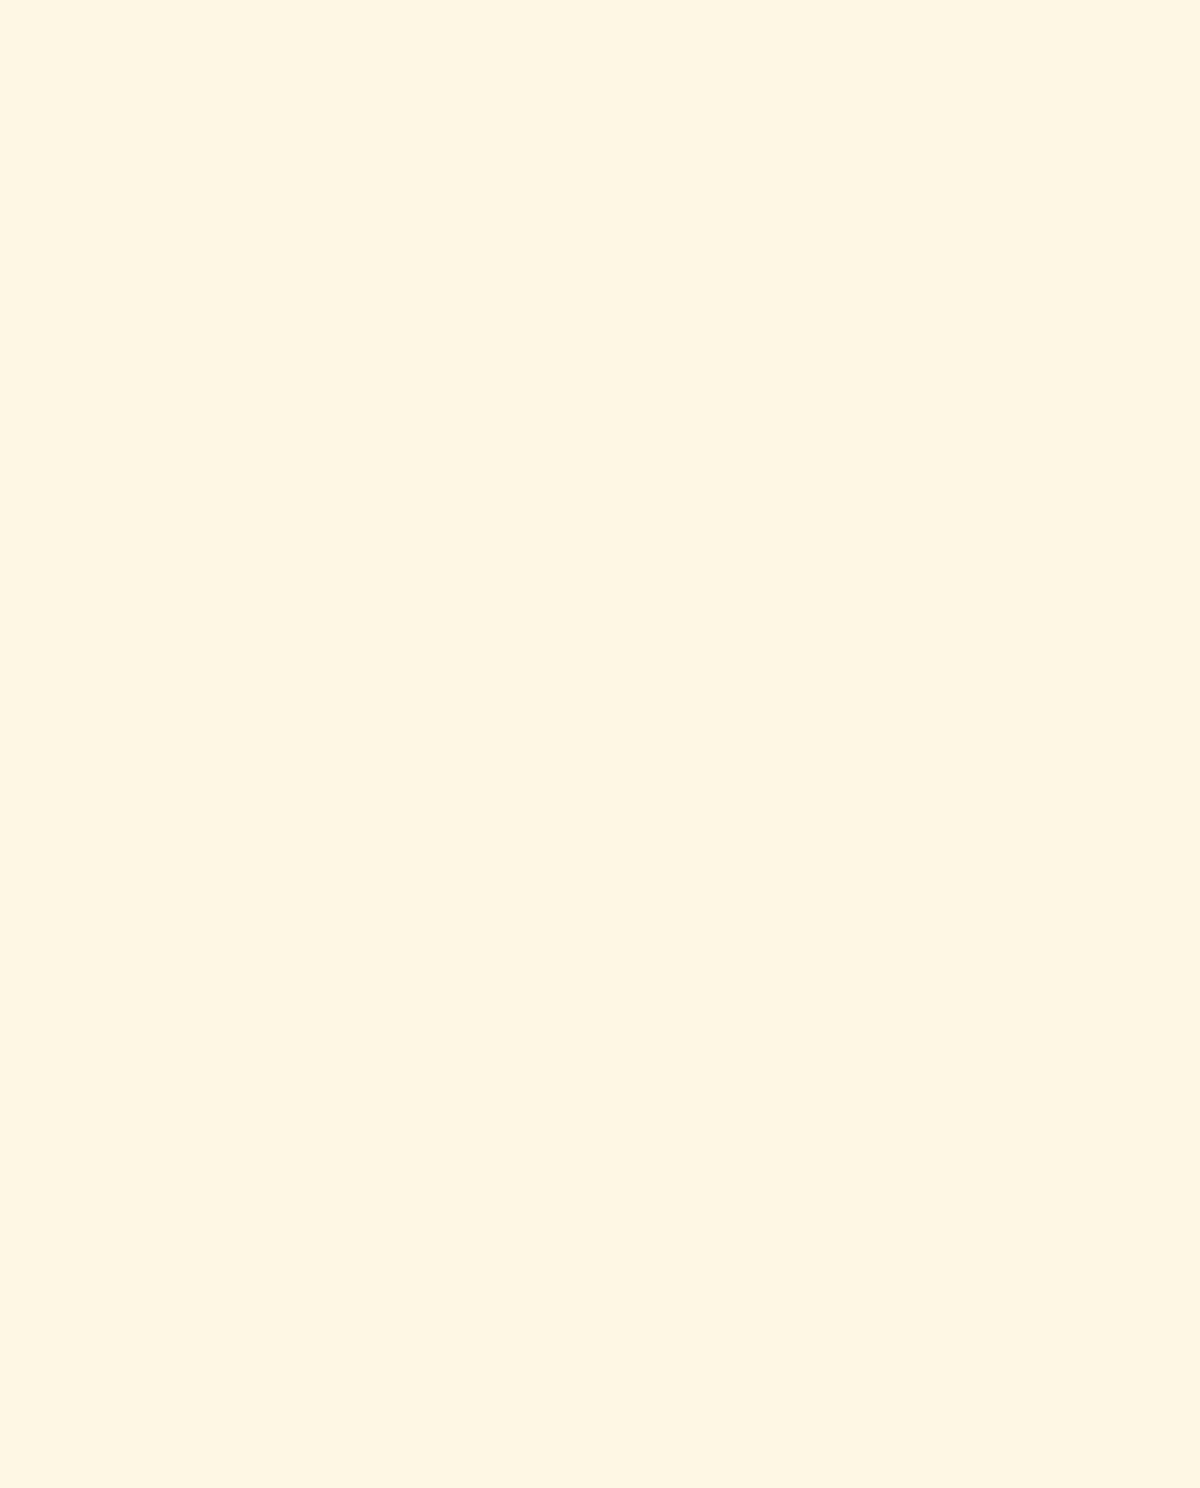 15. Magnolia Zijdeglans